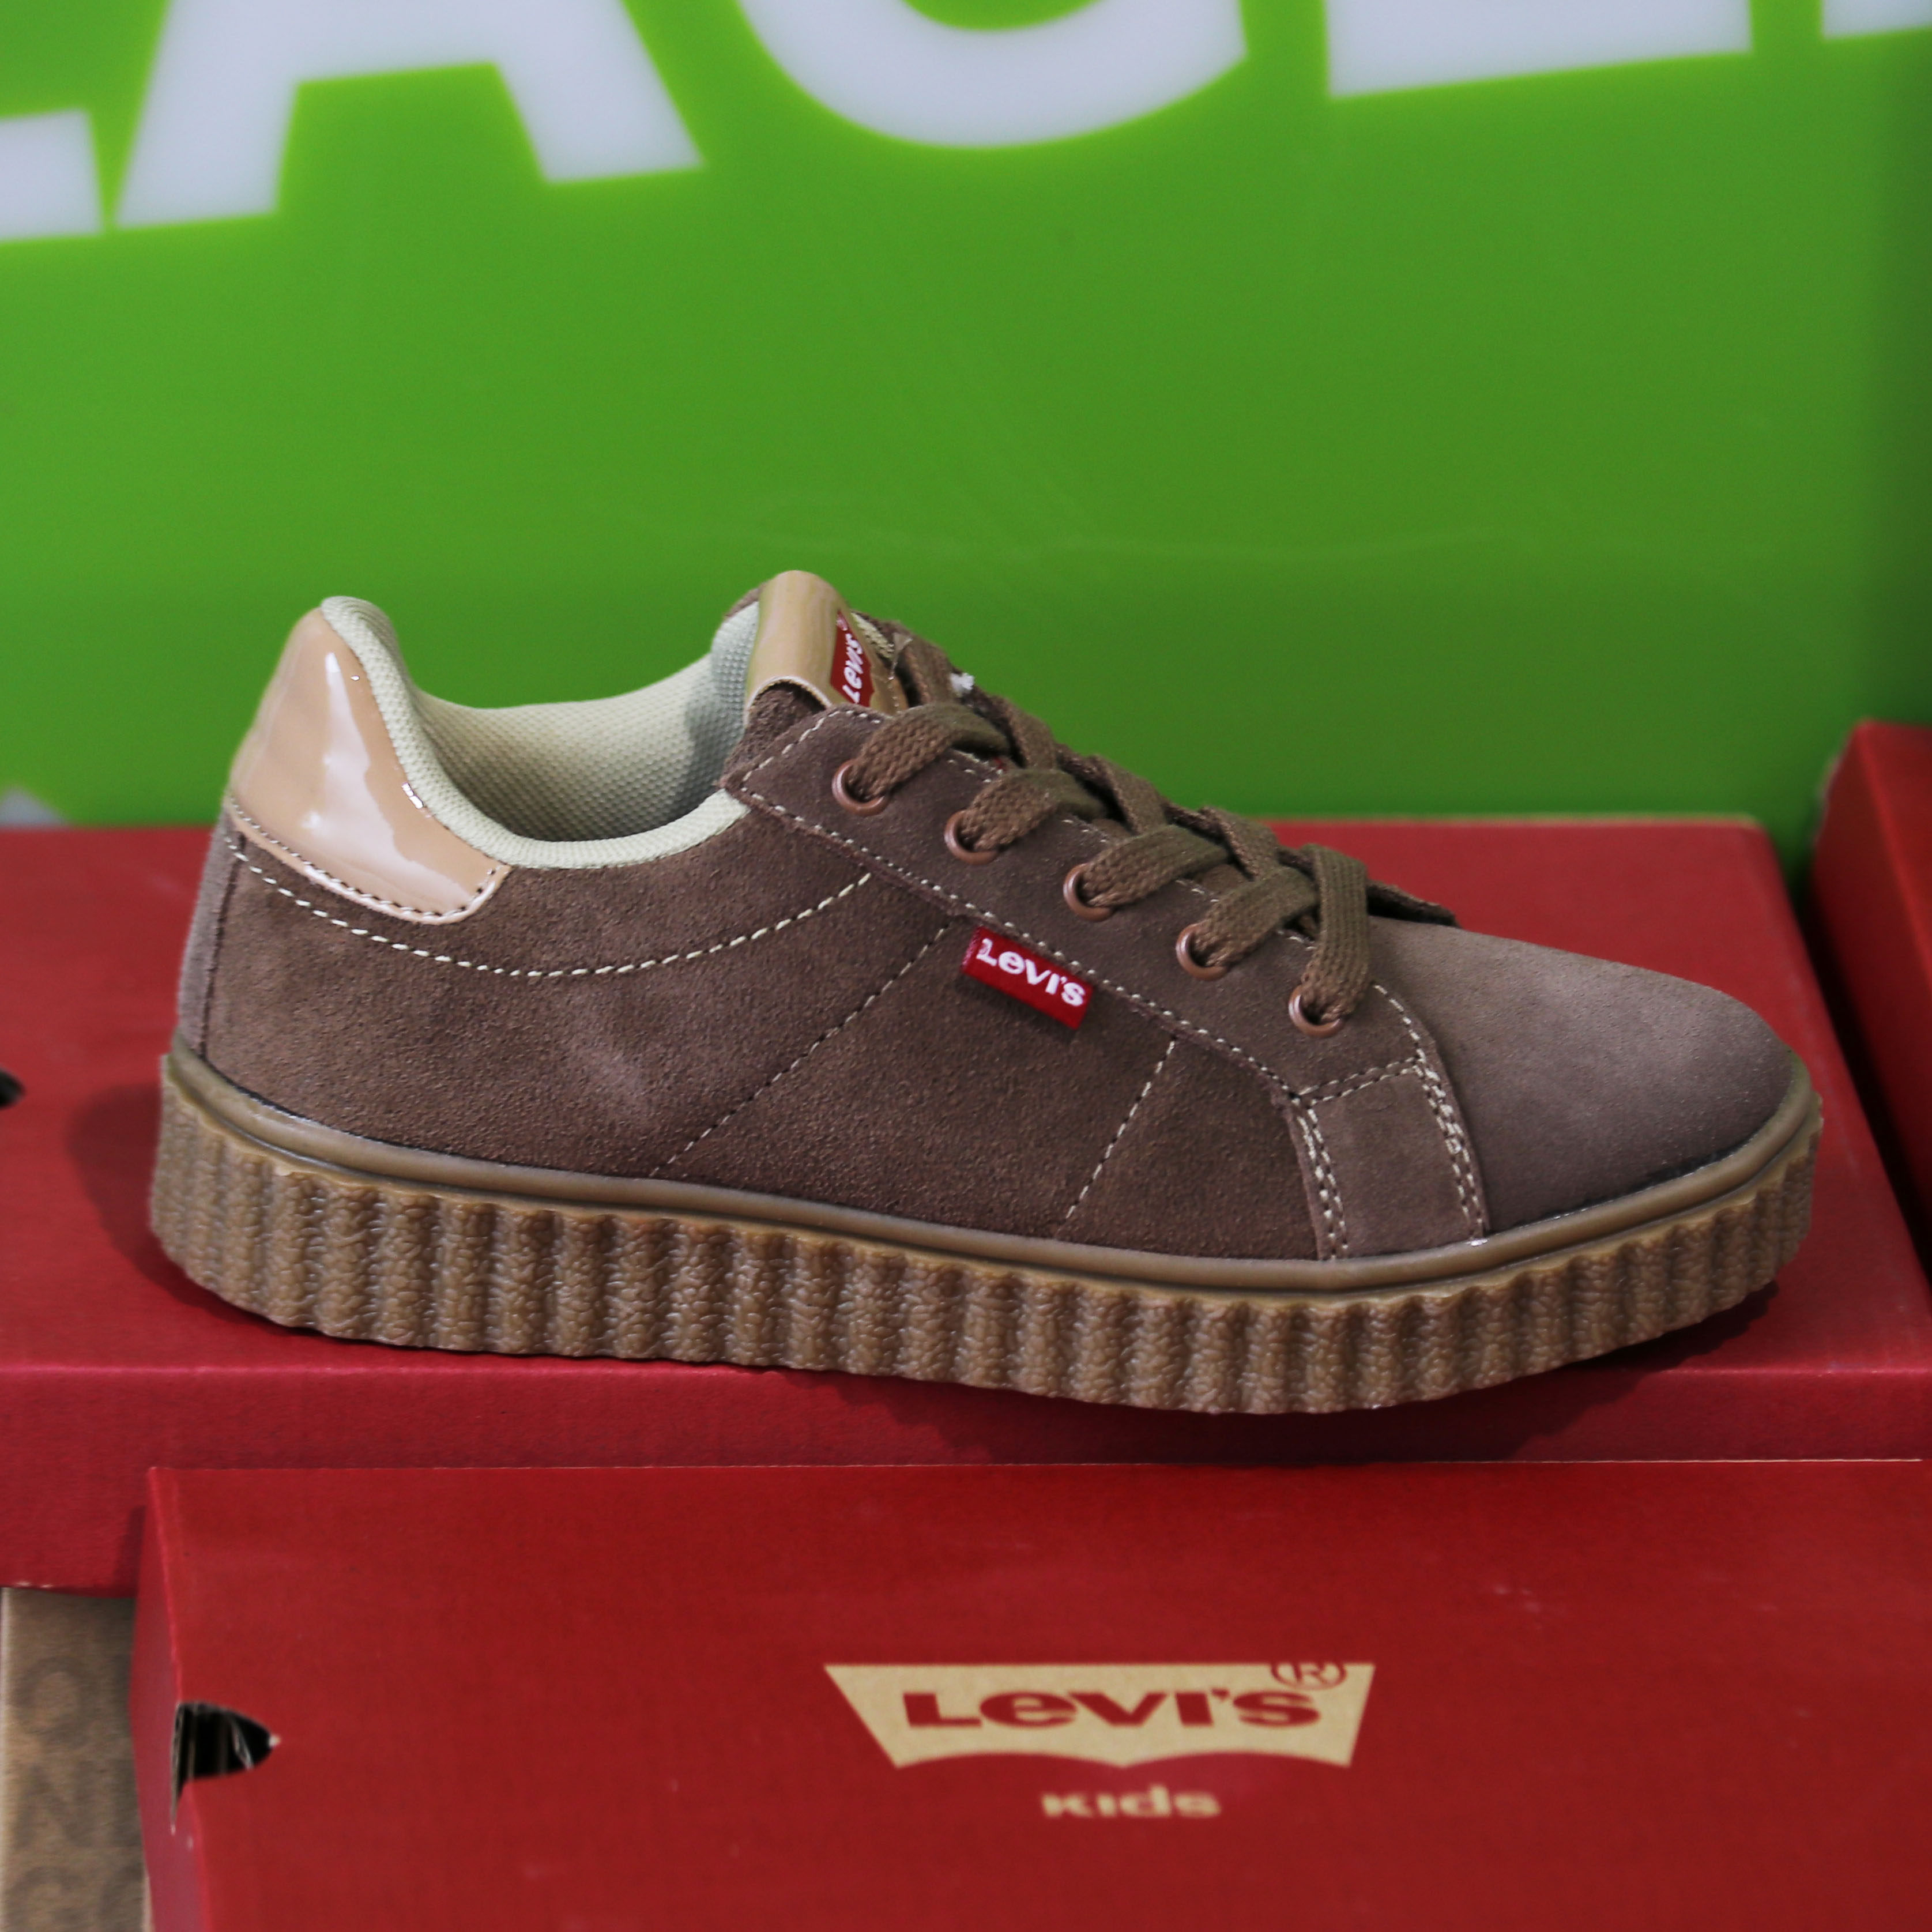 levis kids – new england brun sko barn dame sneakers2